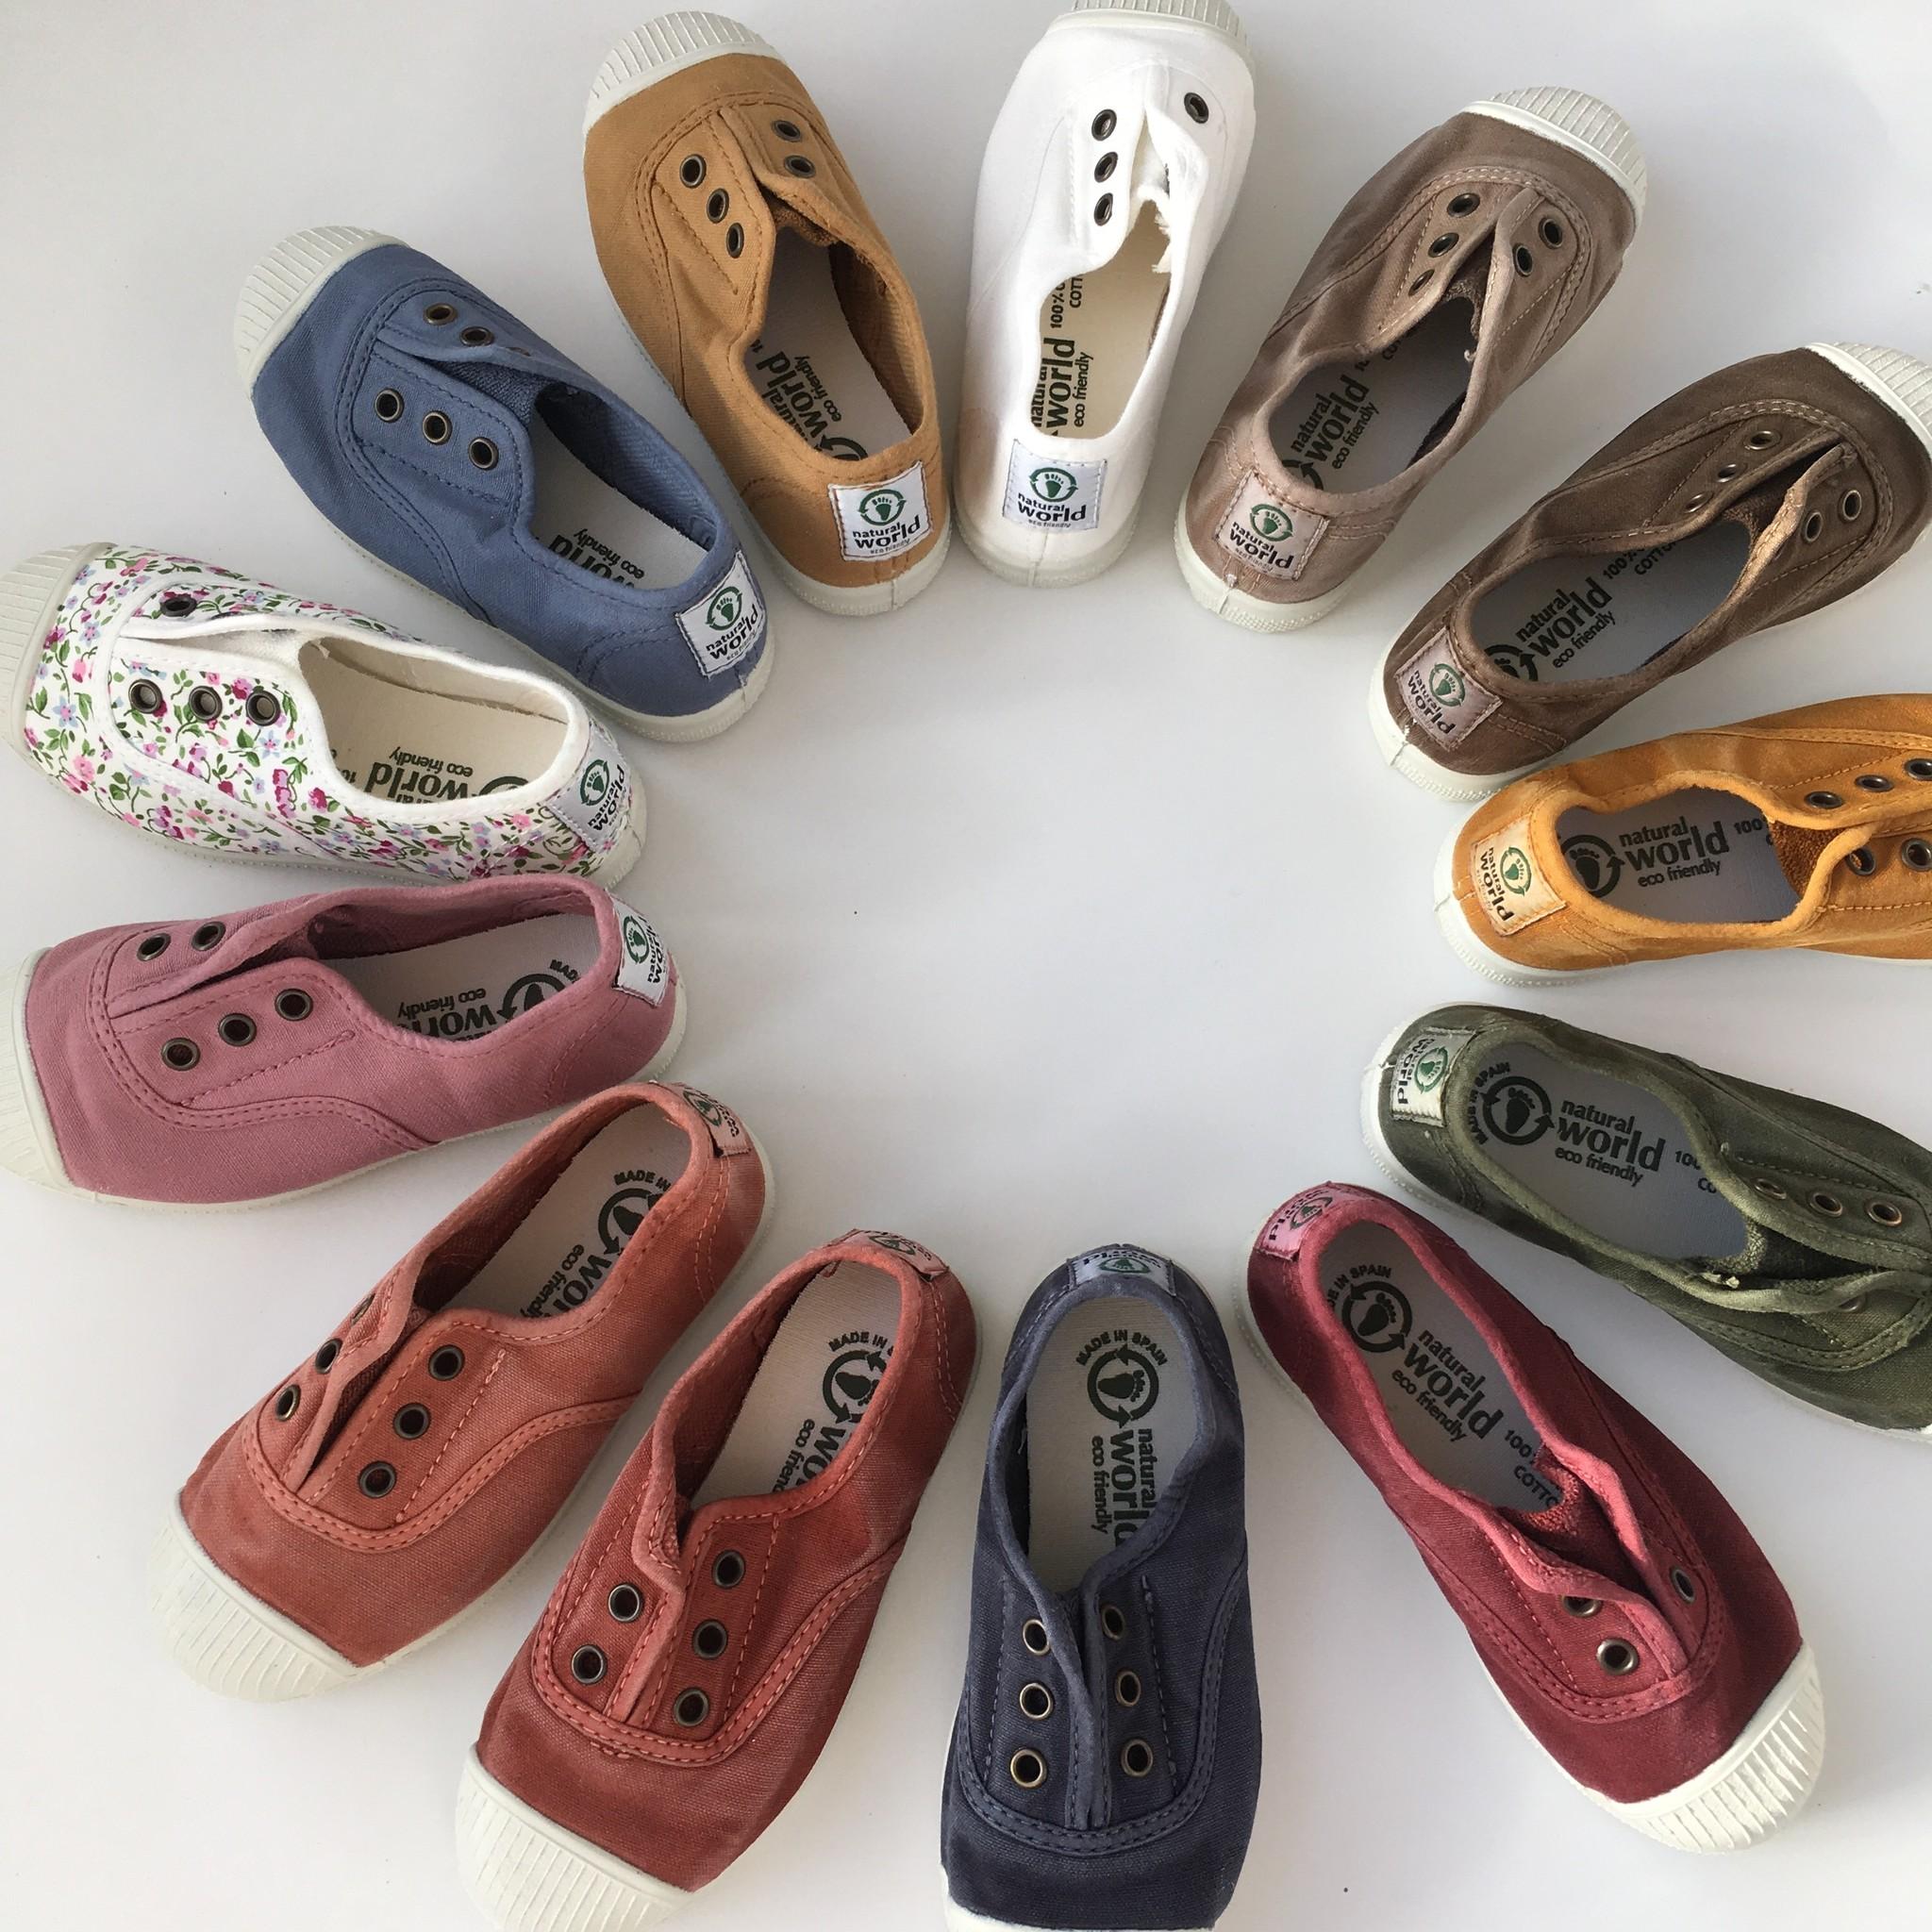 NATURAL WORLD eco kinder sneakers OLD LAVANDA - organic cotton - stone washed light grey - 21 tm 34